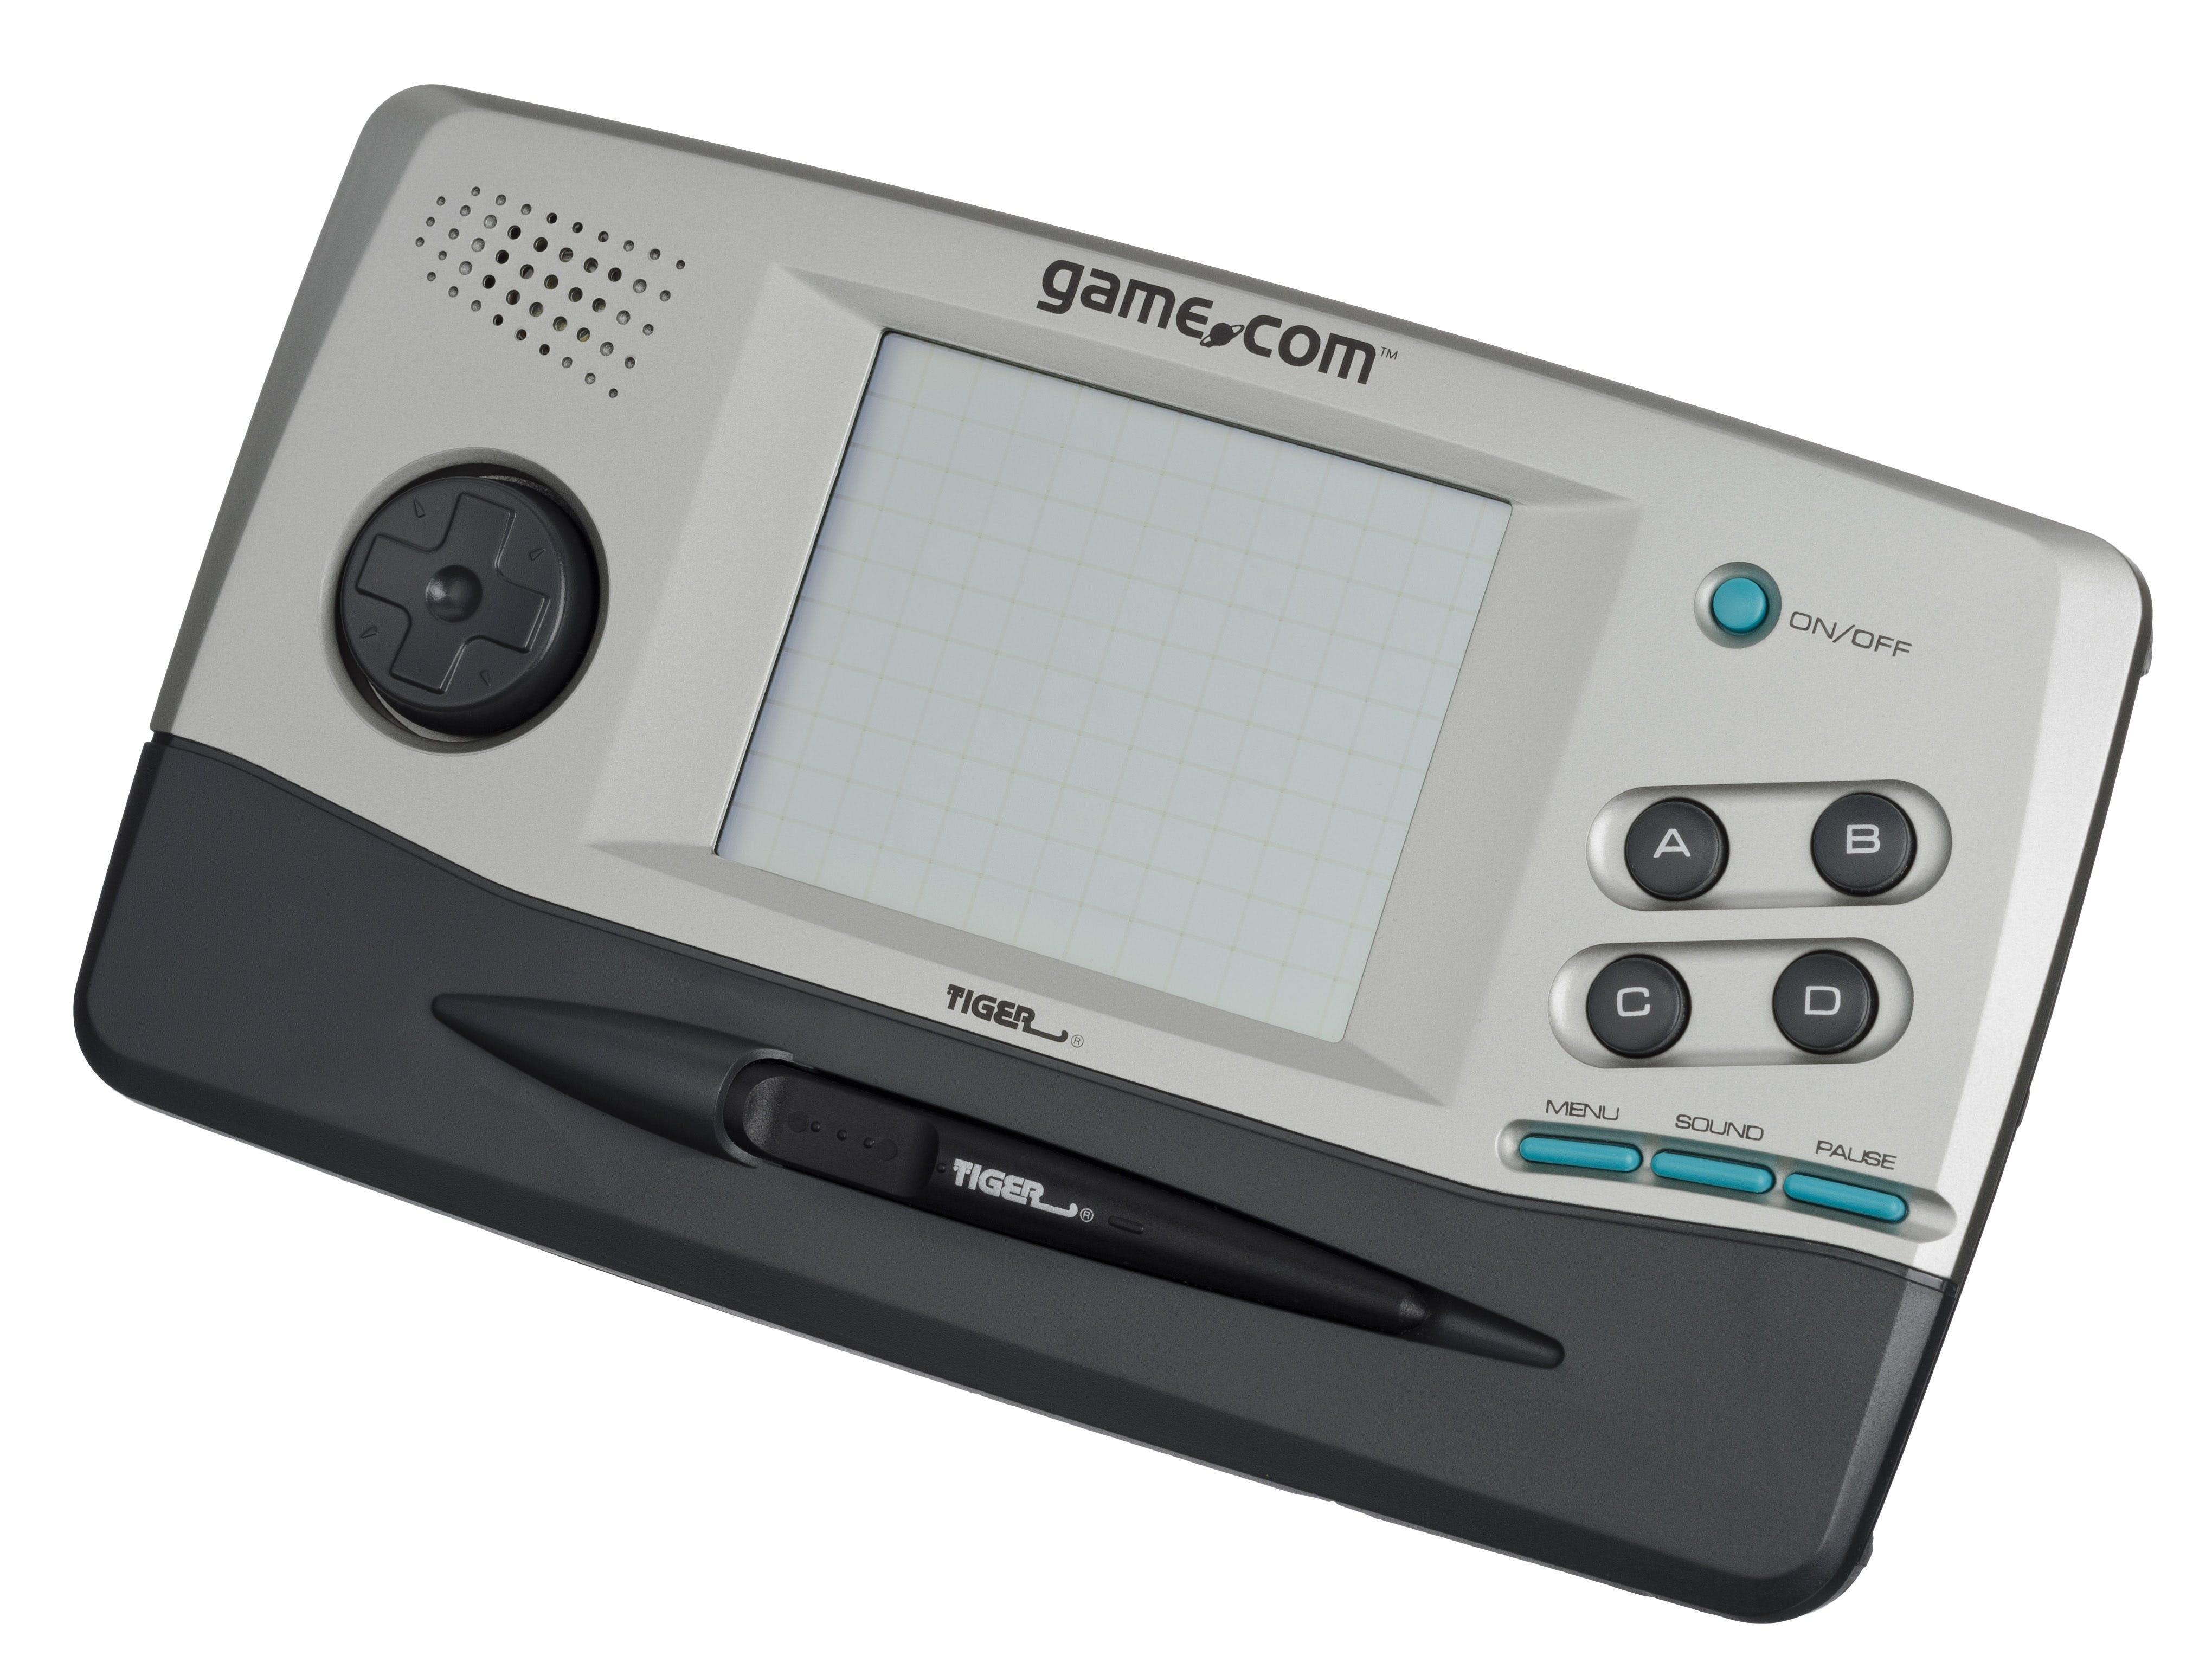 Gray and Black Game-com Console Clip Art